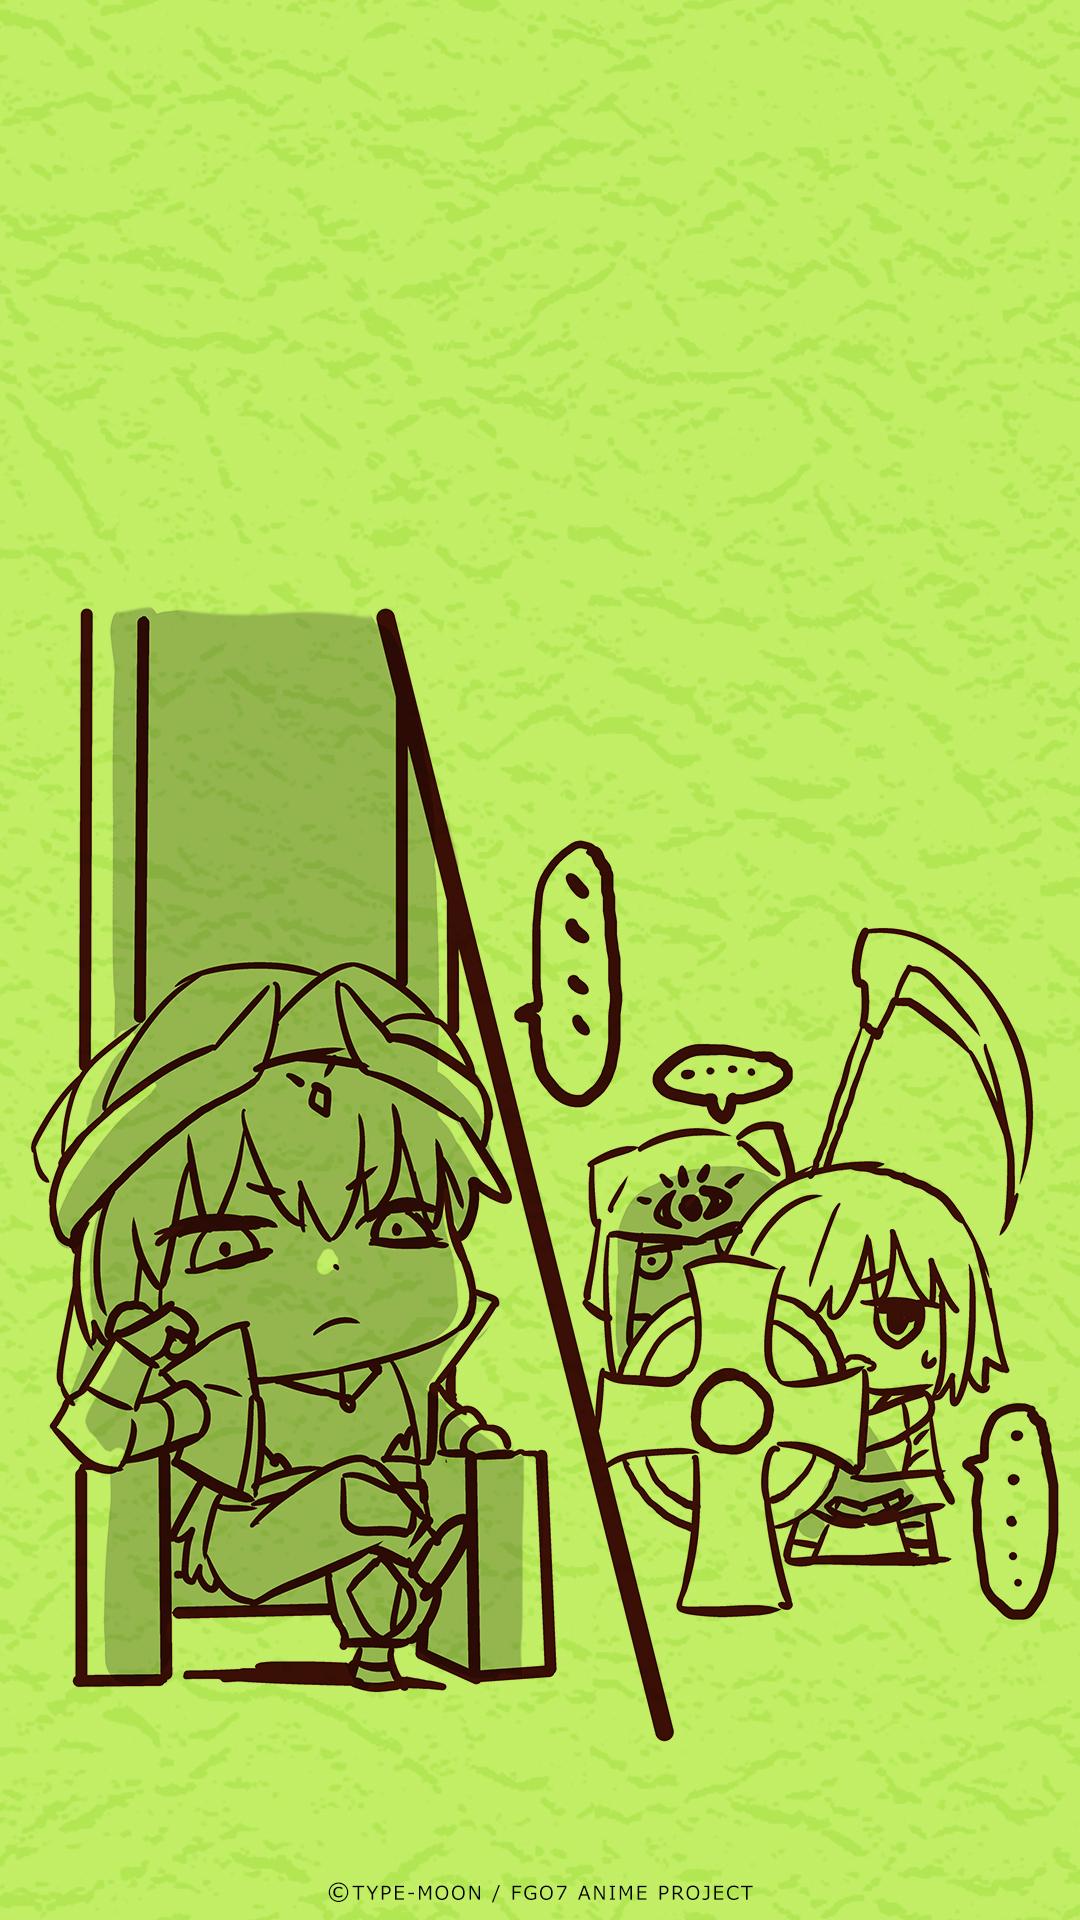 Fate Grand Order Zettai Majuu Sensen Babylonia Mobile Wallpaper Zerochan Anime Image Board